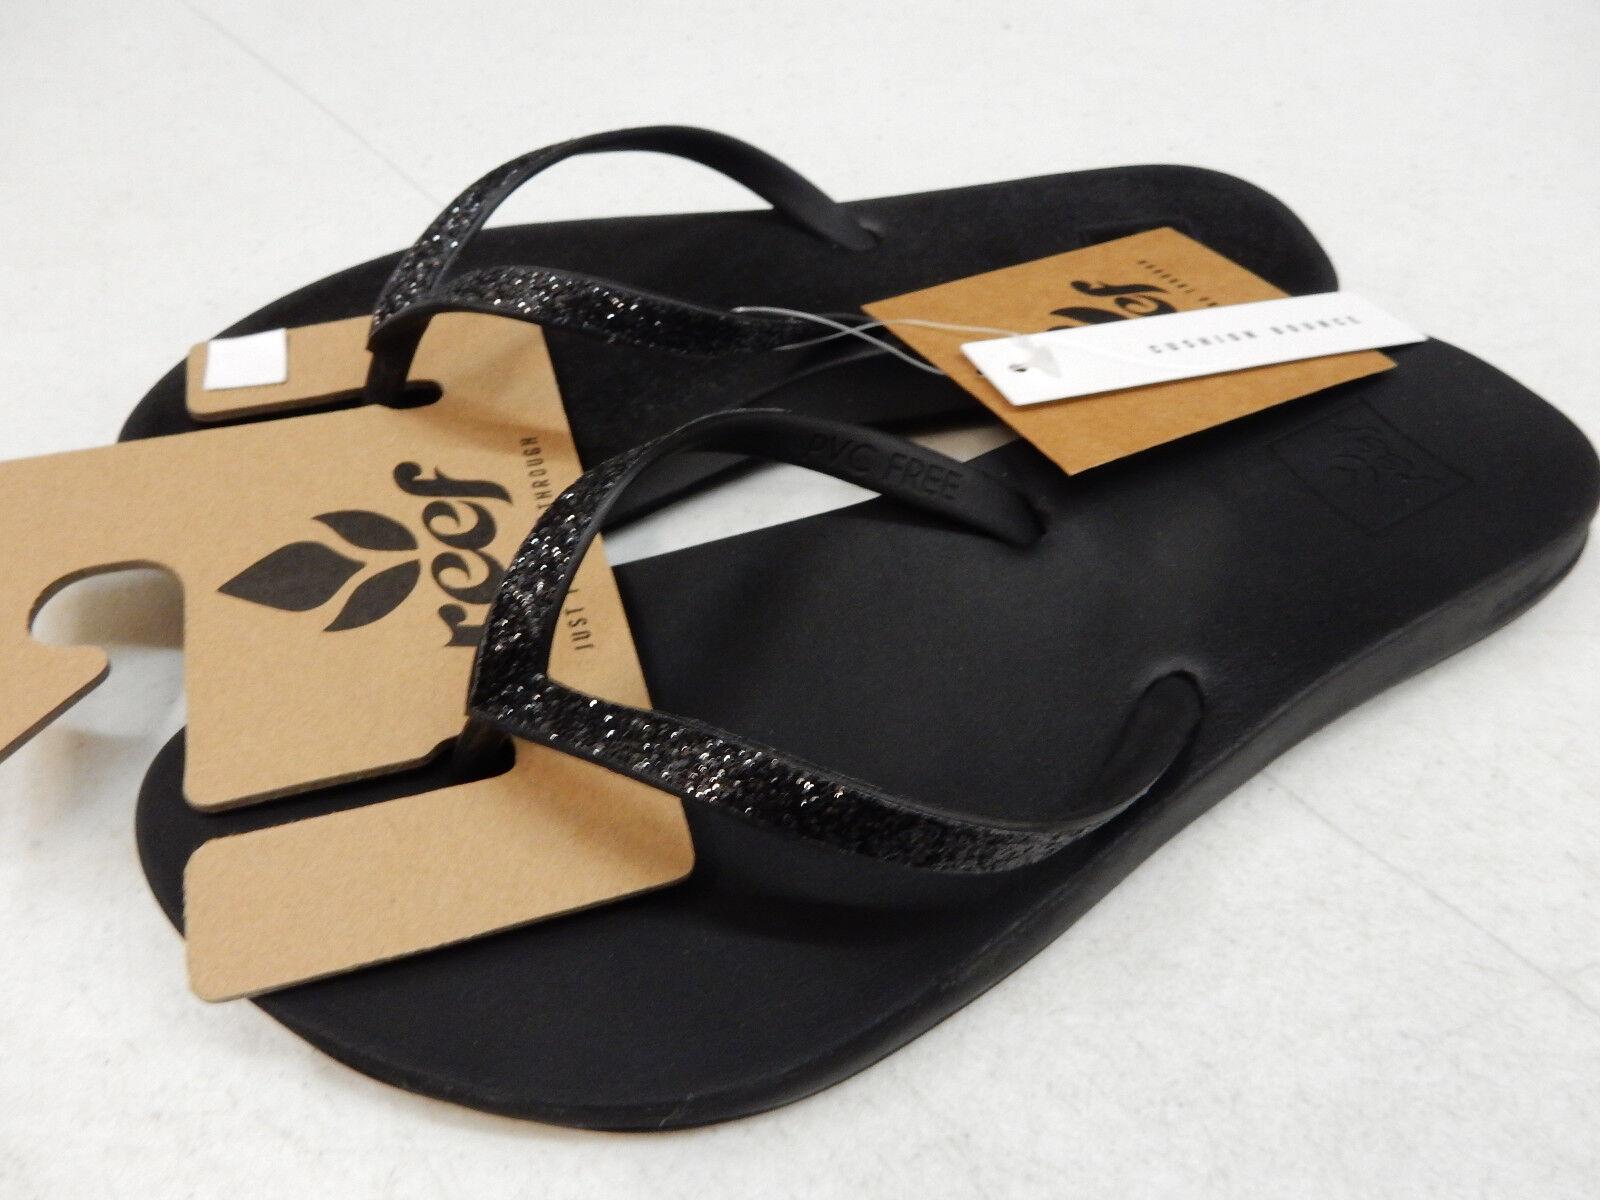 Reef Women/'s Cushion Bounce Stargazer Black Flip Flops Sandals Size 9